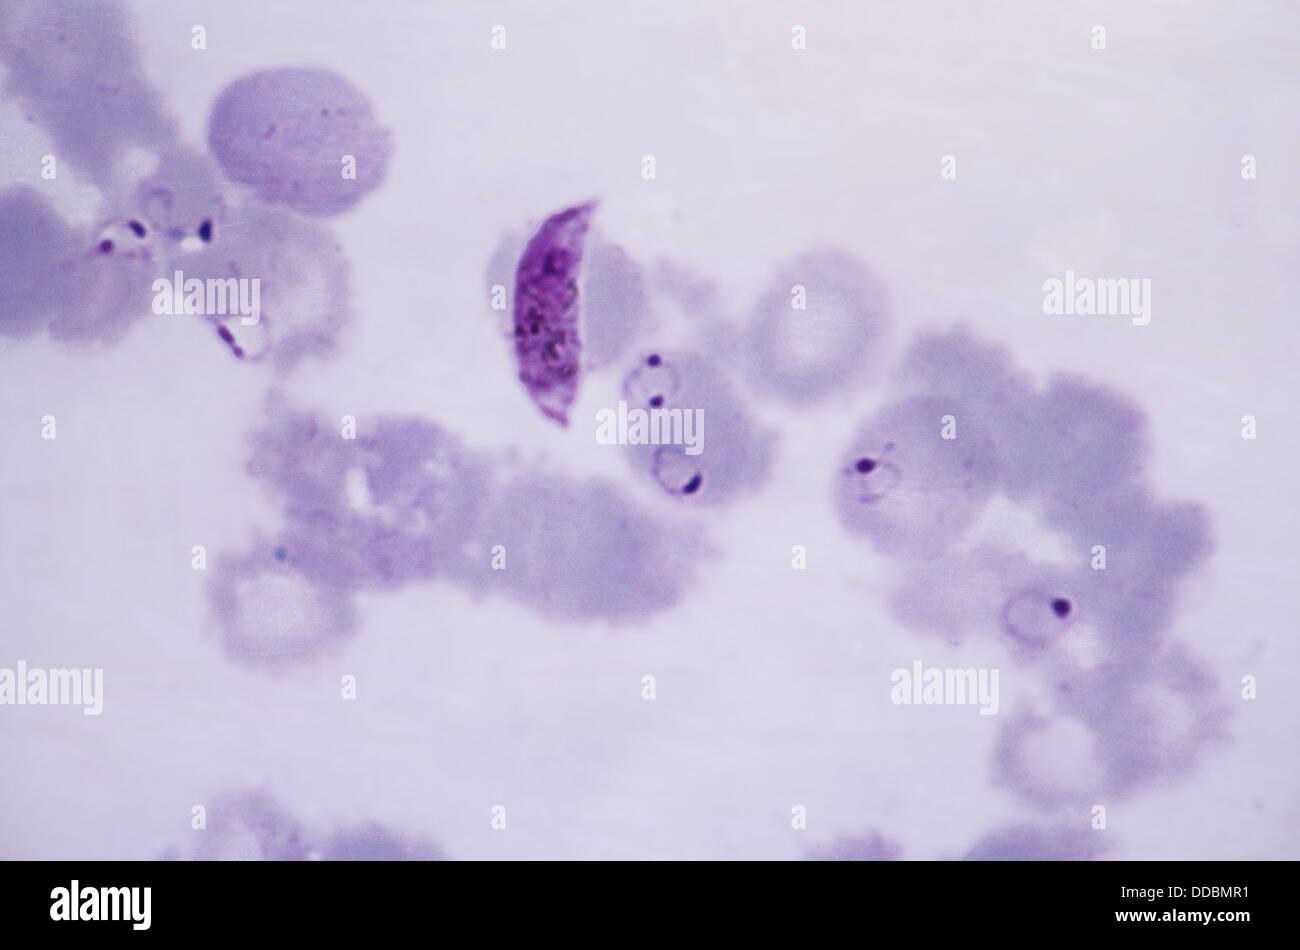 blood smear plasmodium falciparum 1000 x protozoan